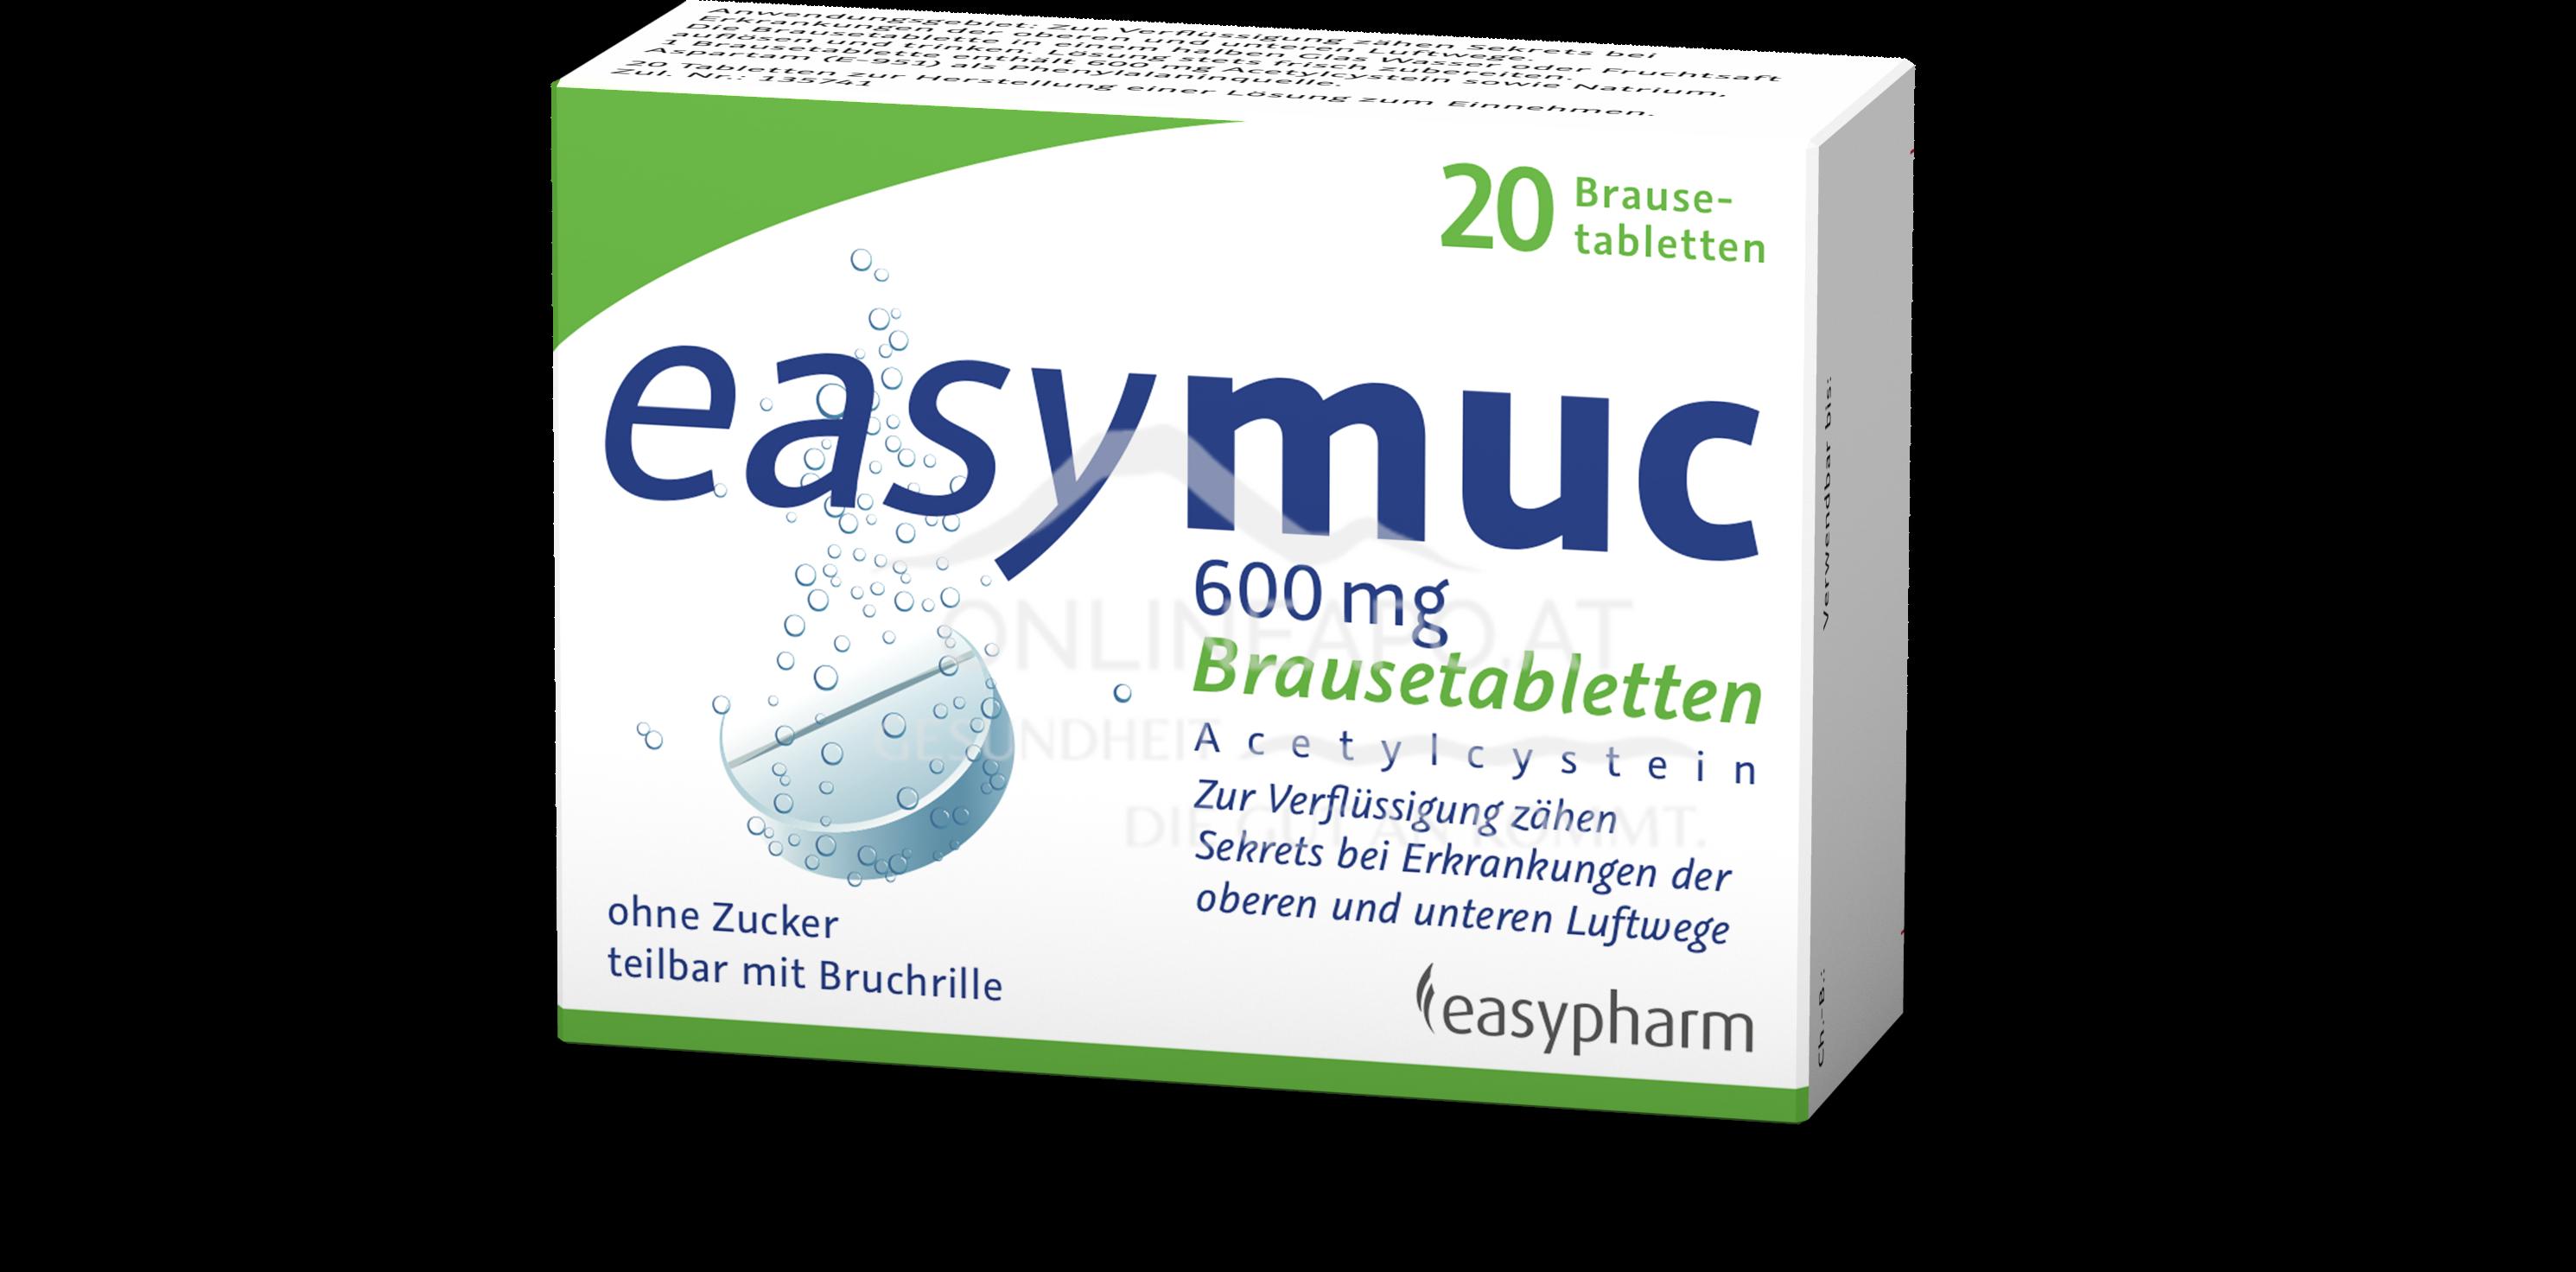 easymuc 600mg Brausetabletten